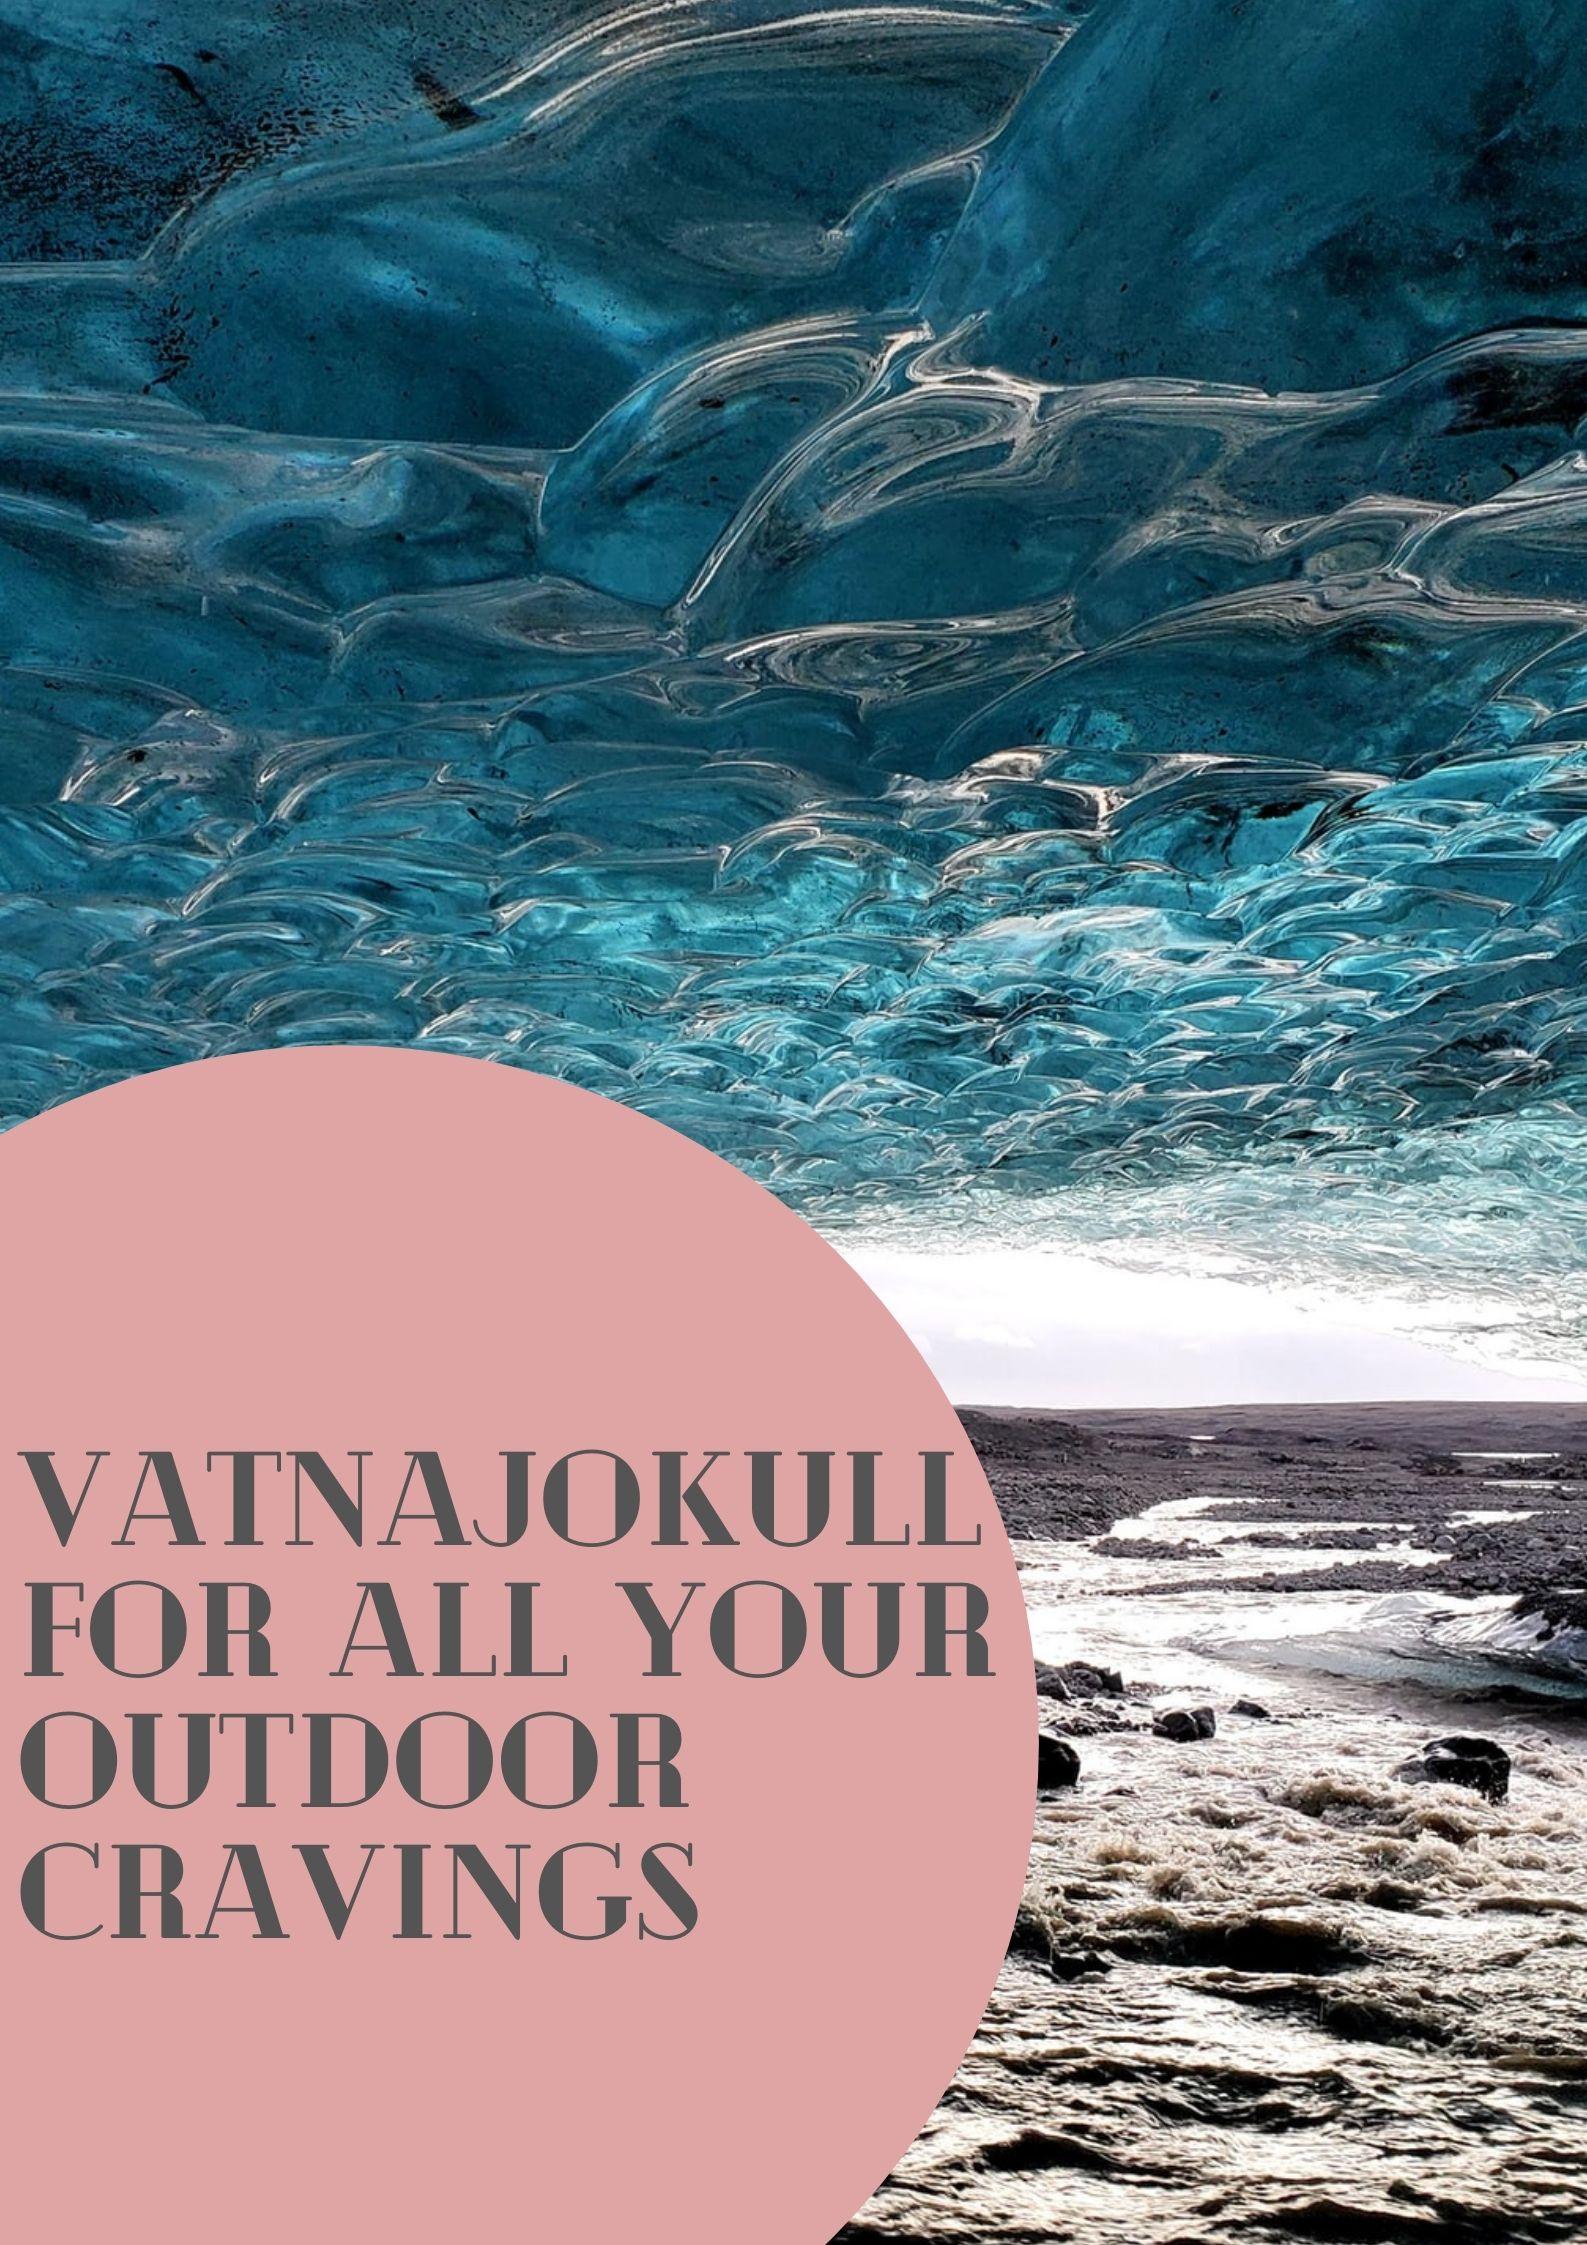 Vatnajokull for All Your Outdoor Cravings